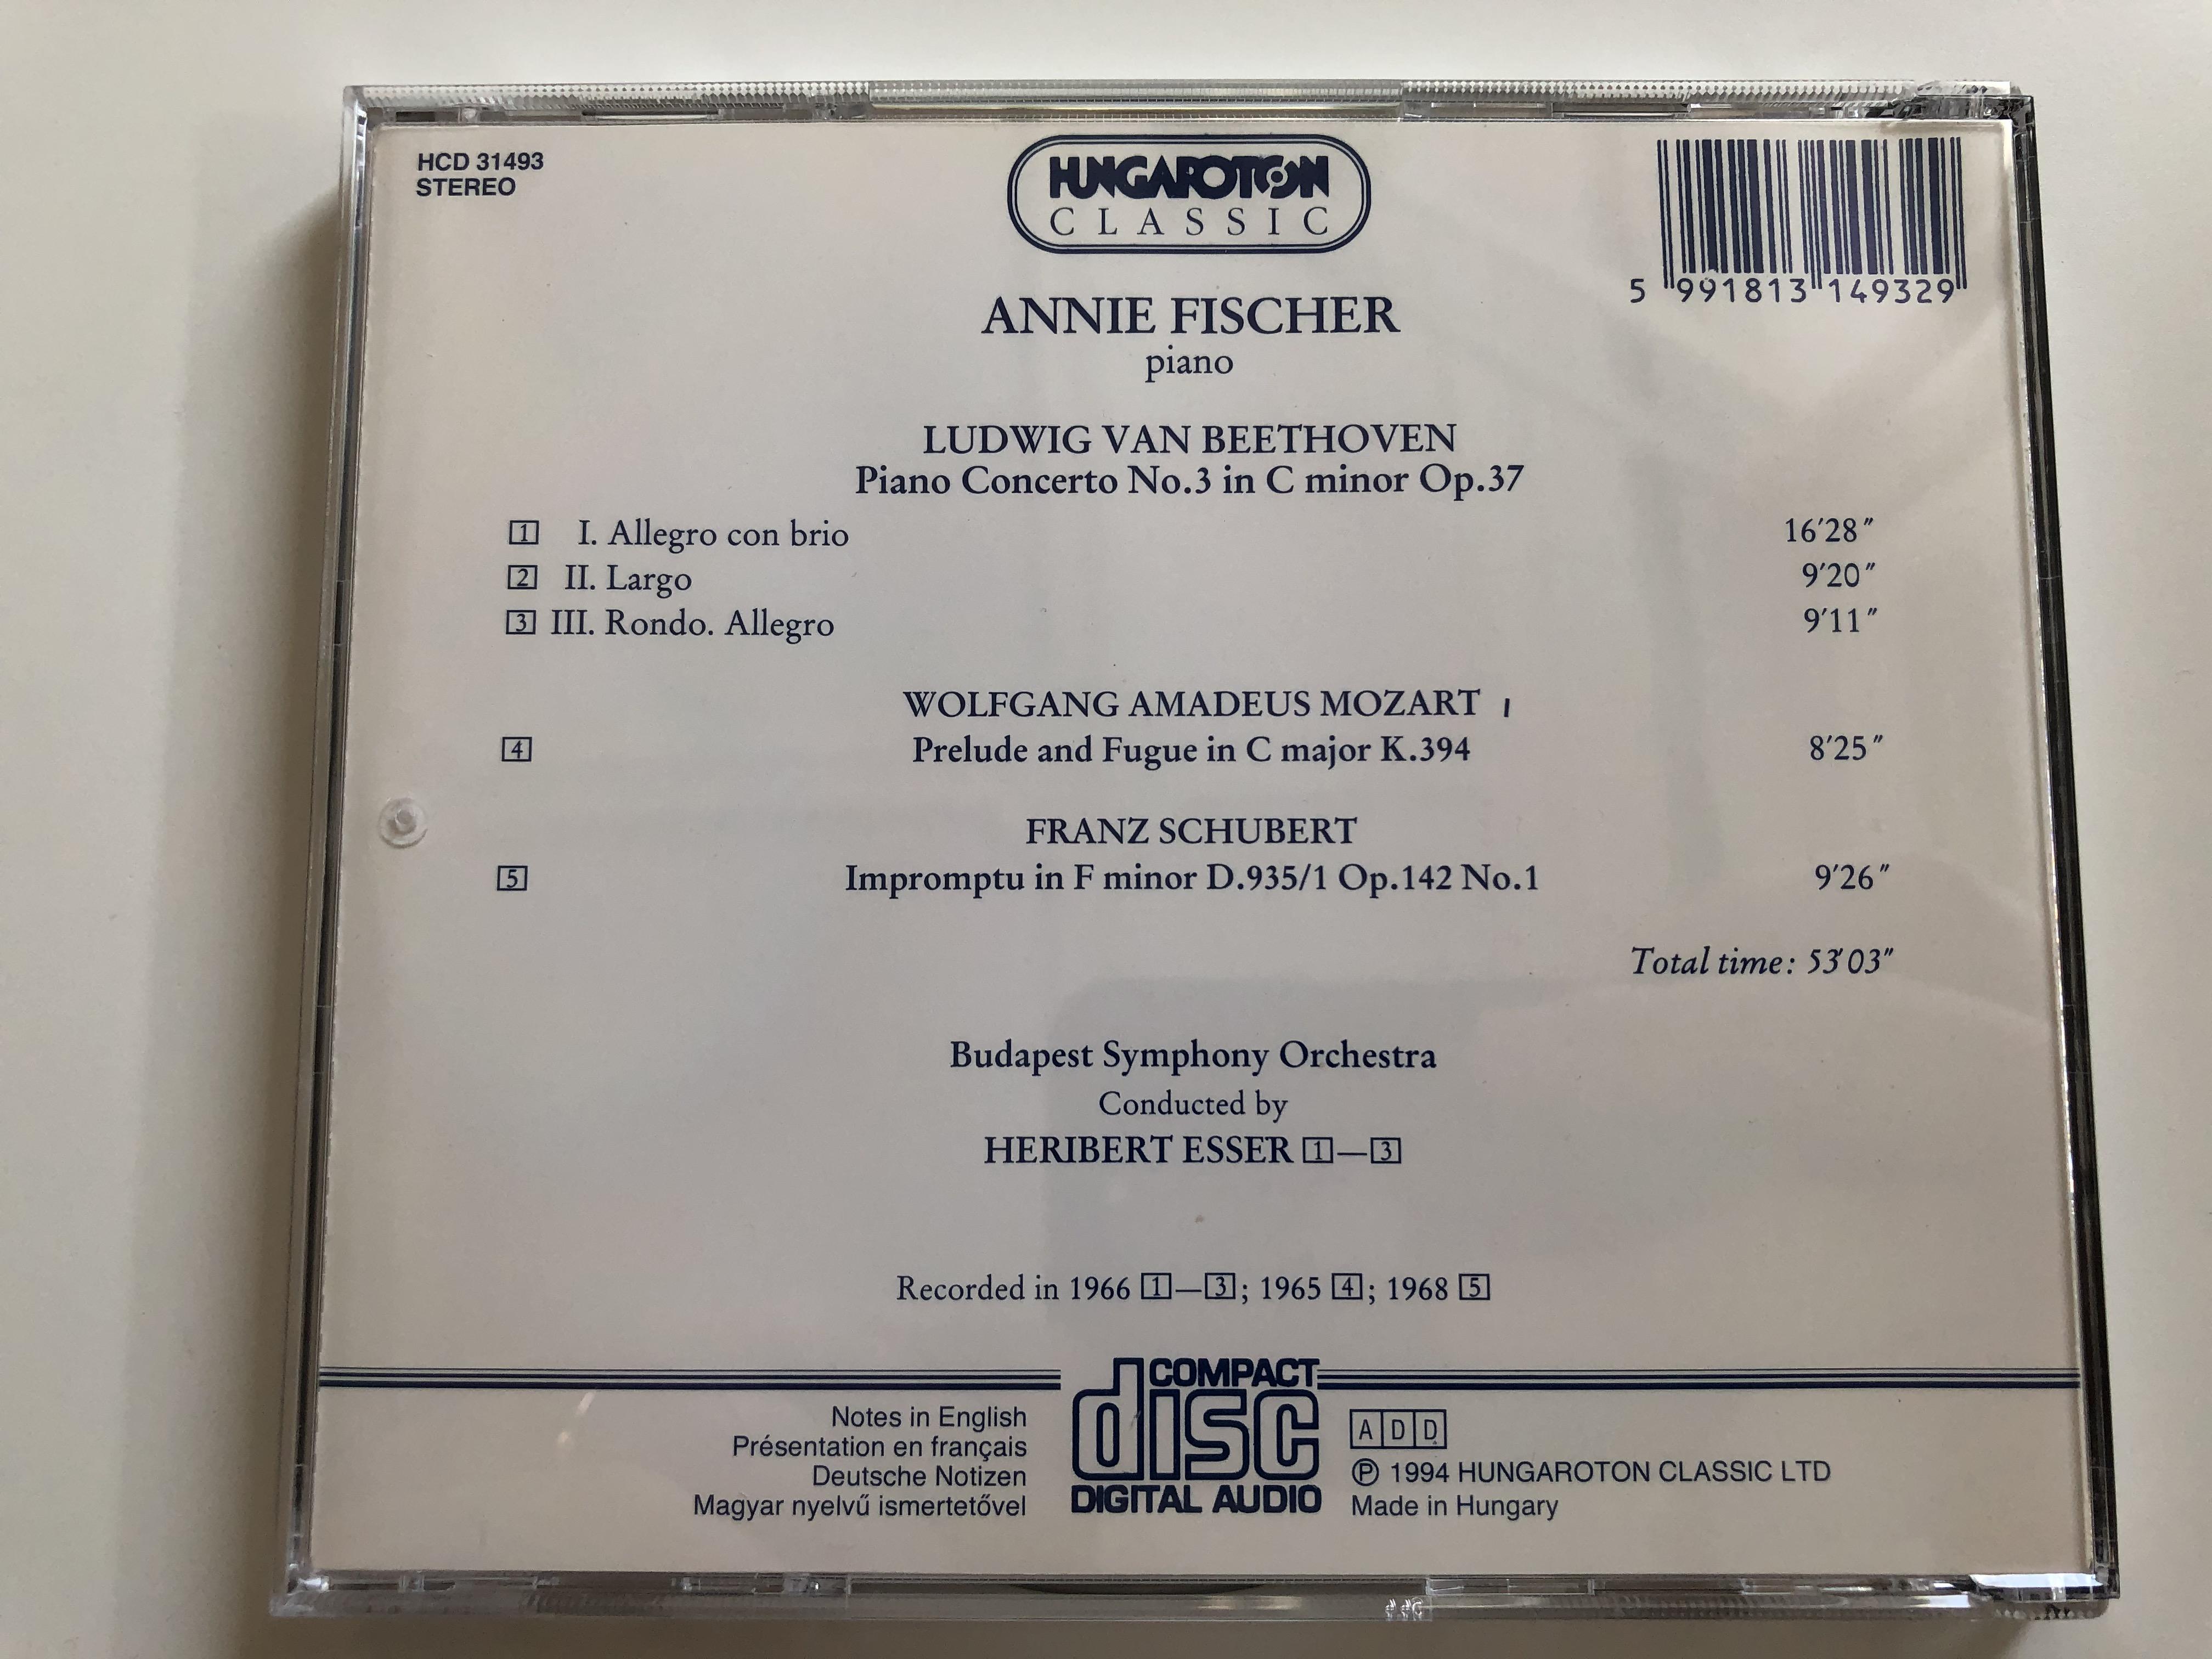 annie-fischer-piano-beethoven-piano-concerto-no.3-mozart-prelude-and-fugue-k.394-schubert-impromptu-in-f-minor-d.9351-budapest-symphony-orchestra-heribert-esser-hungaroton-classic-6-.jpg